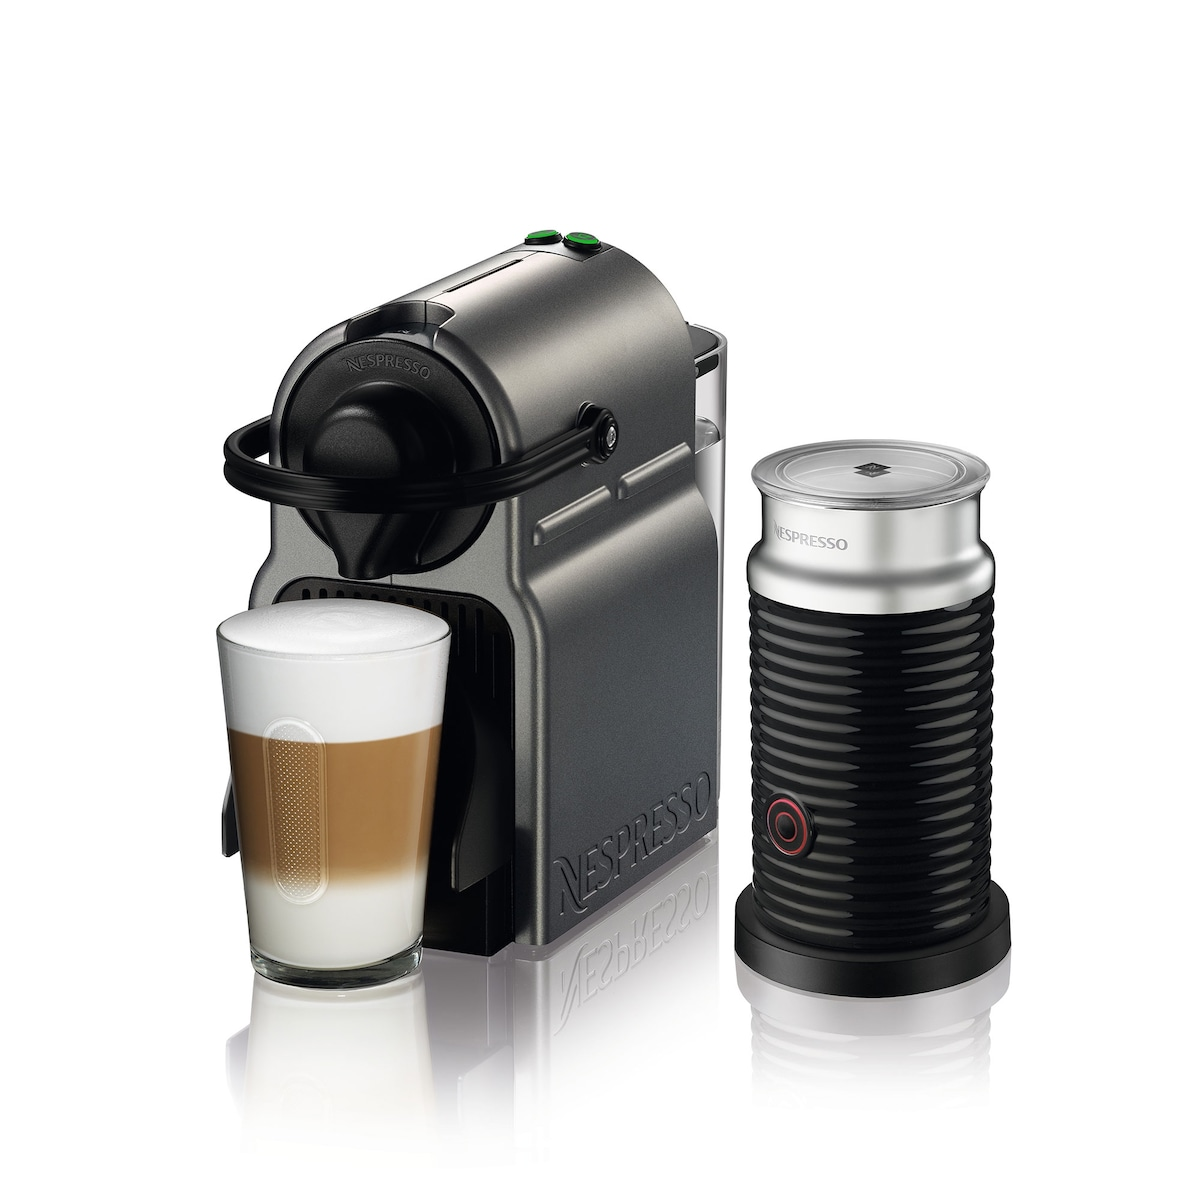 cafetiere nespresso linen chest